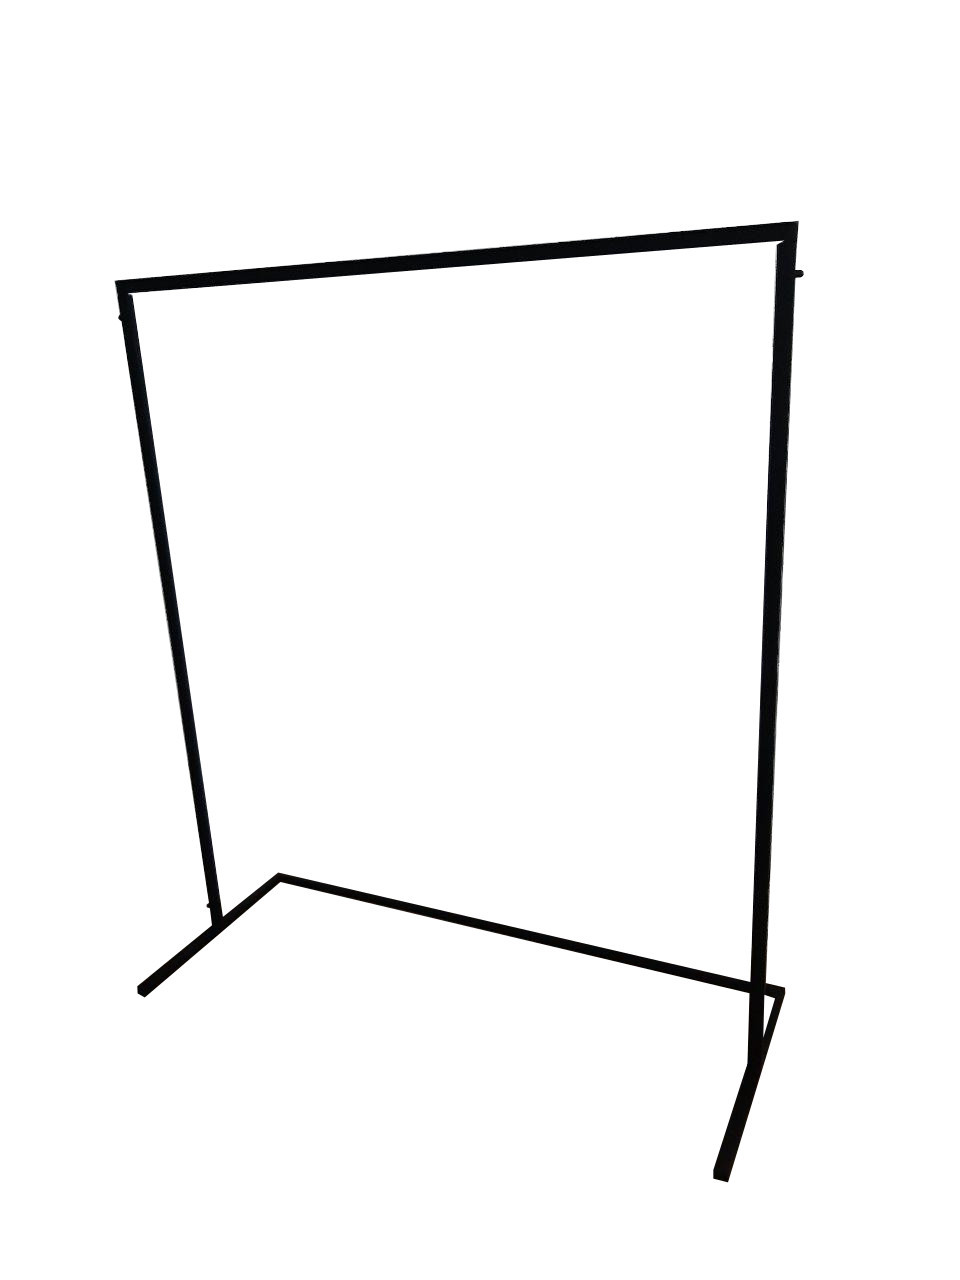 Вешалка стойка для одежды GoodsMetall в стиле Лофт 1700х1500х600мм ВШ111